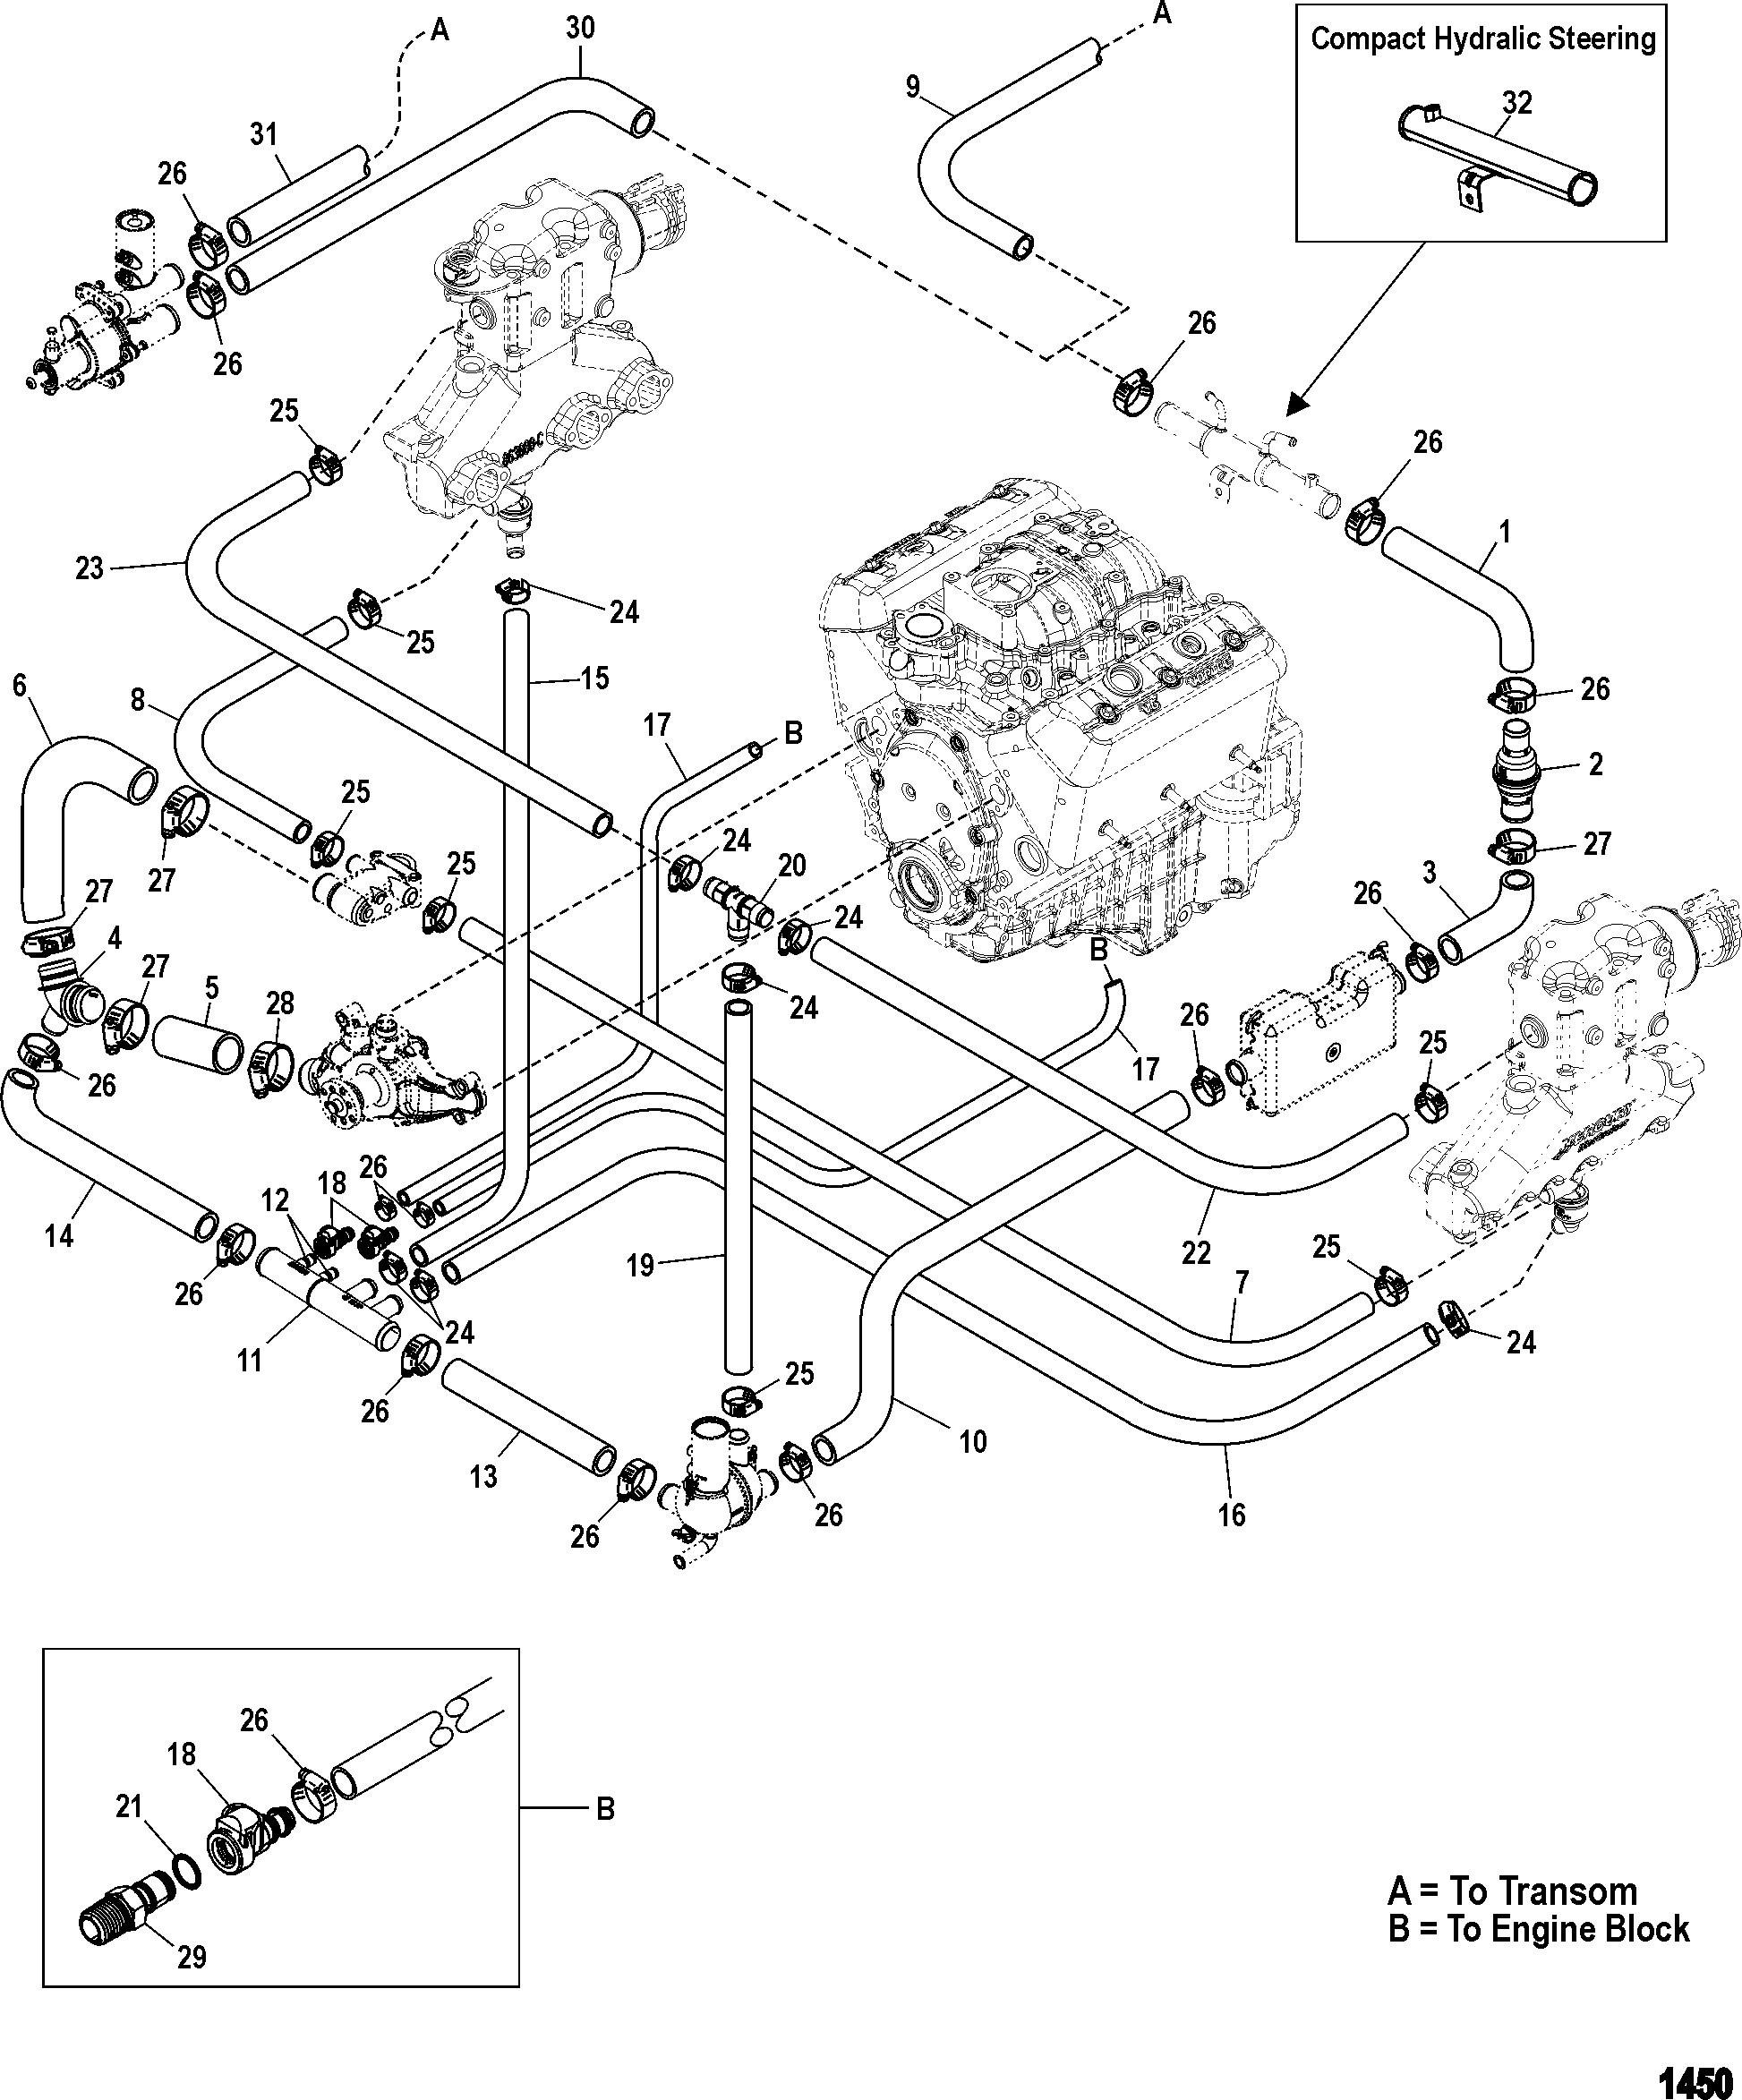 hight resolution of 95 camaro v6 3800 engine diagrams